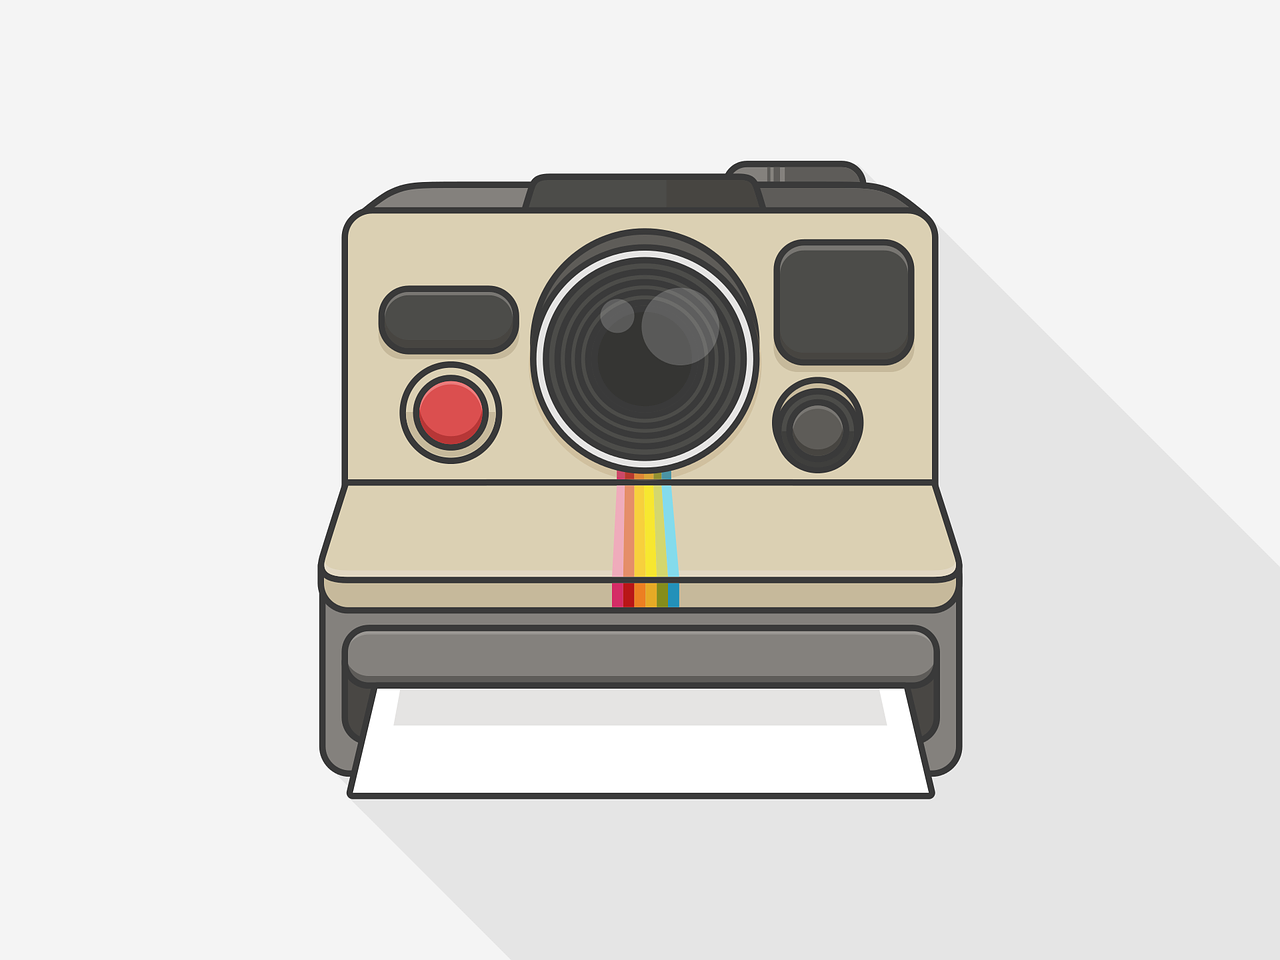 polaroid-2315182_1280.png